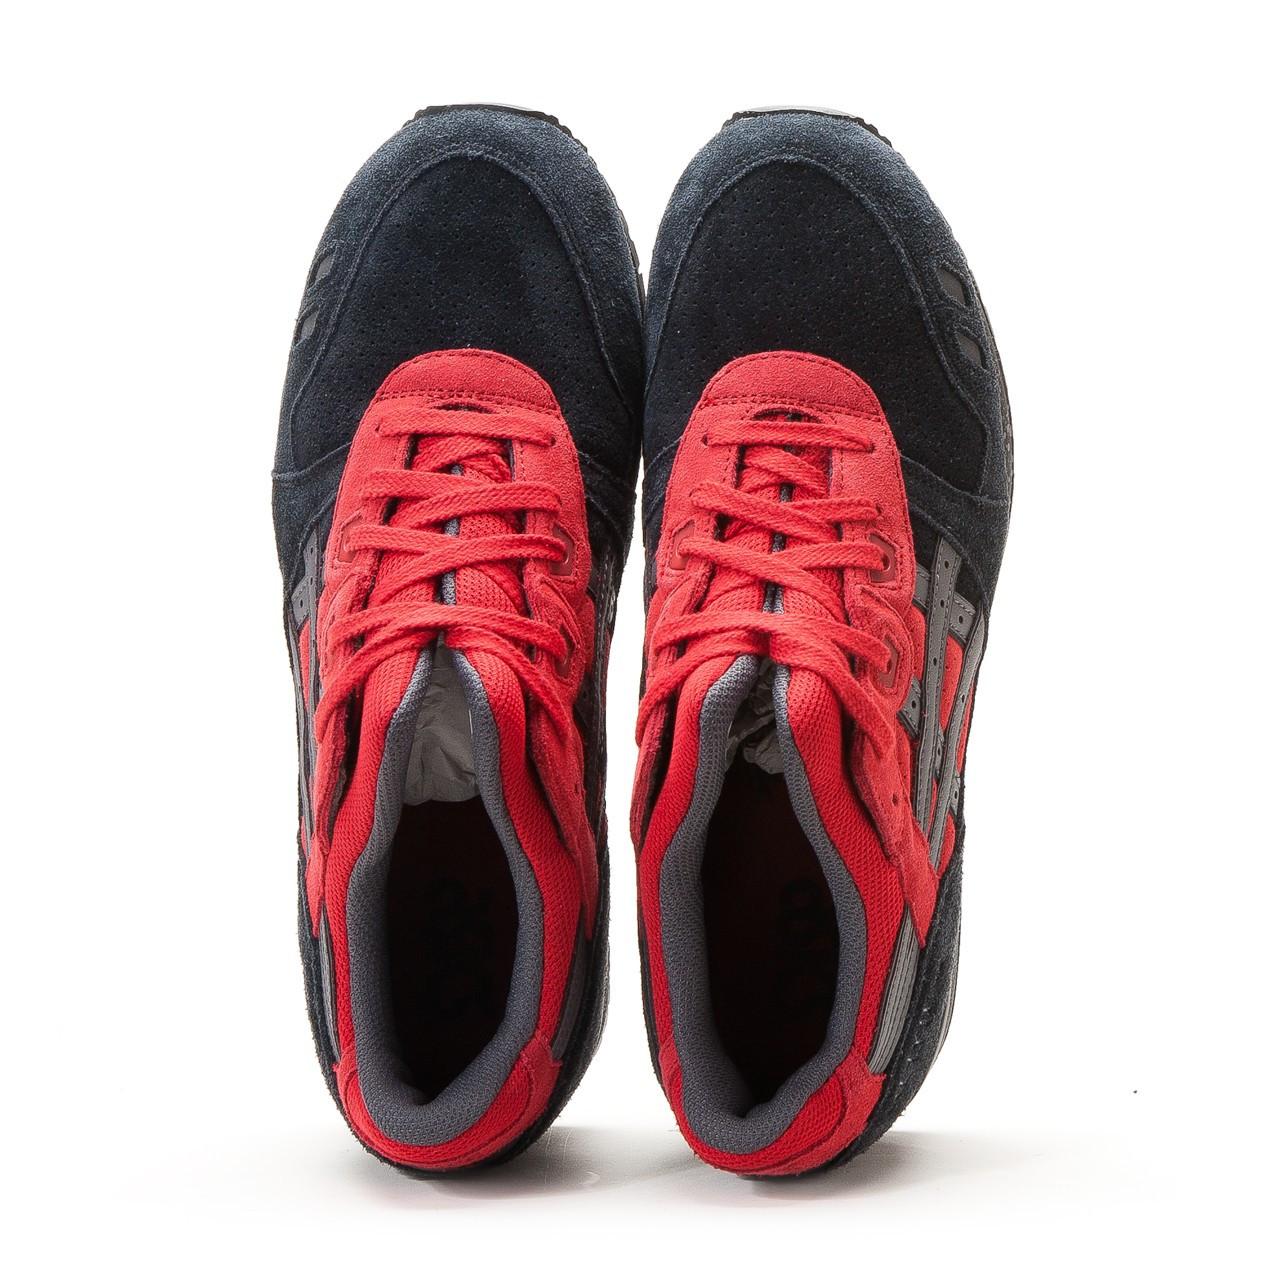 Кроссовки Asics Gel Lyte III X Mas Pack Bad Santa Black Red купить в ... ff56244dba83d